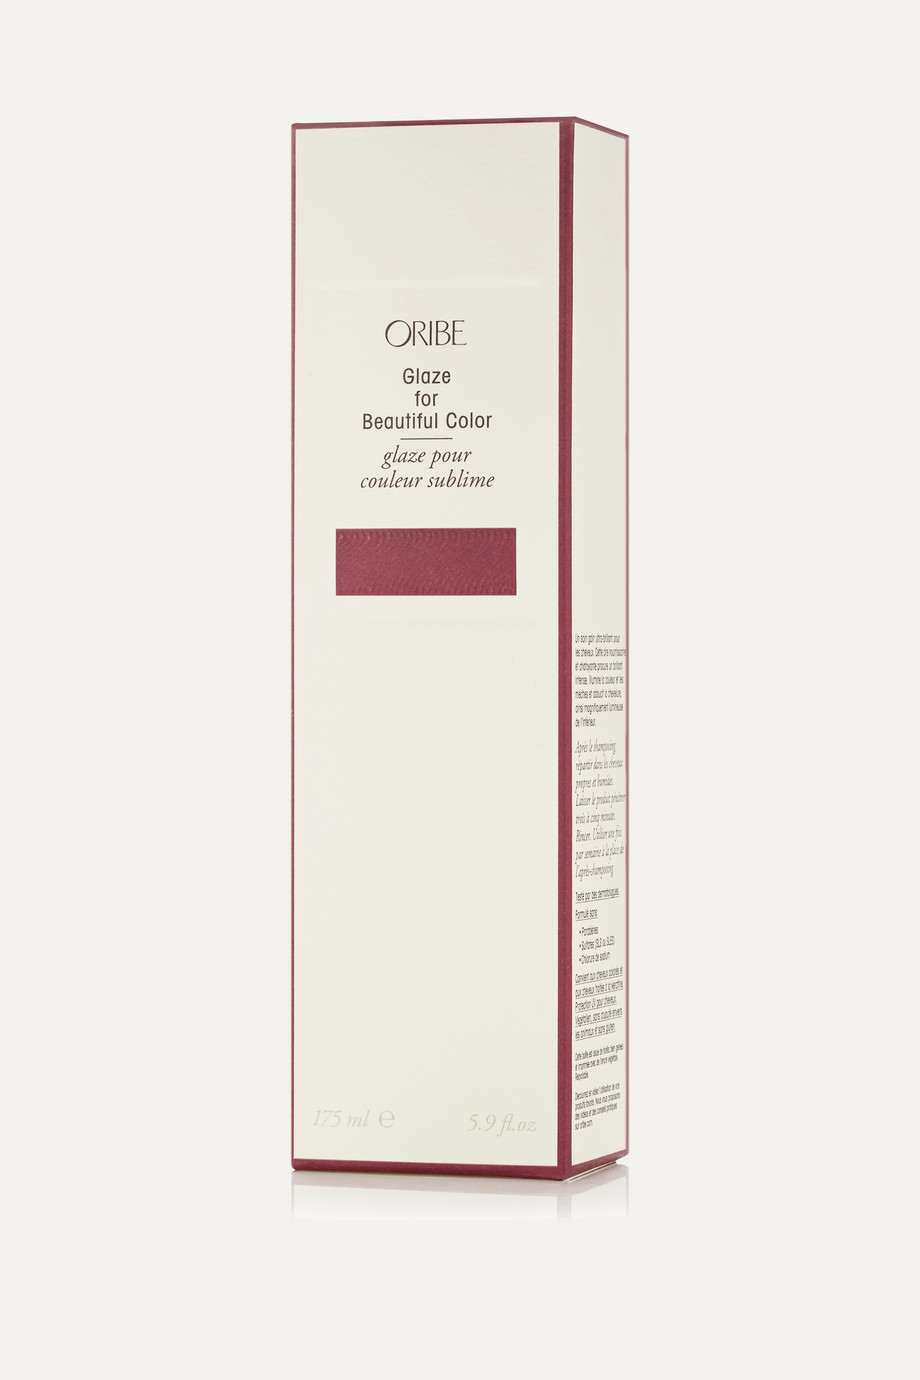 Oribe Glaze For Beautiful Hair Color, 175ml